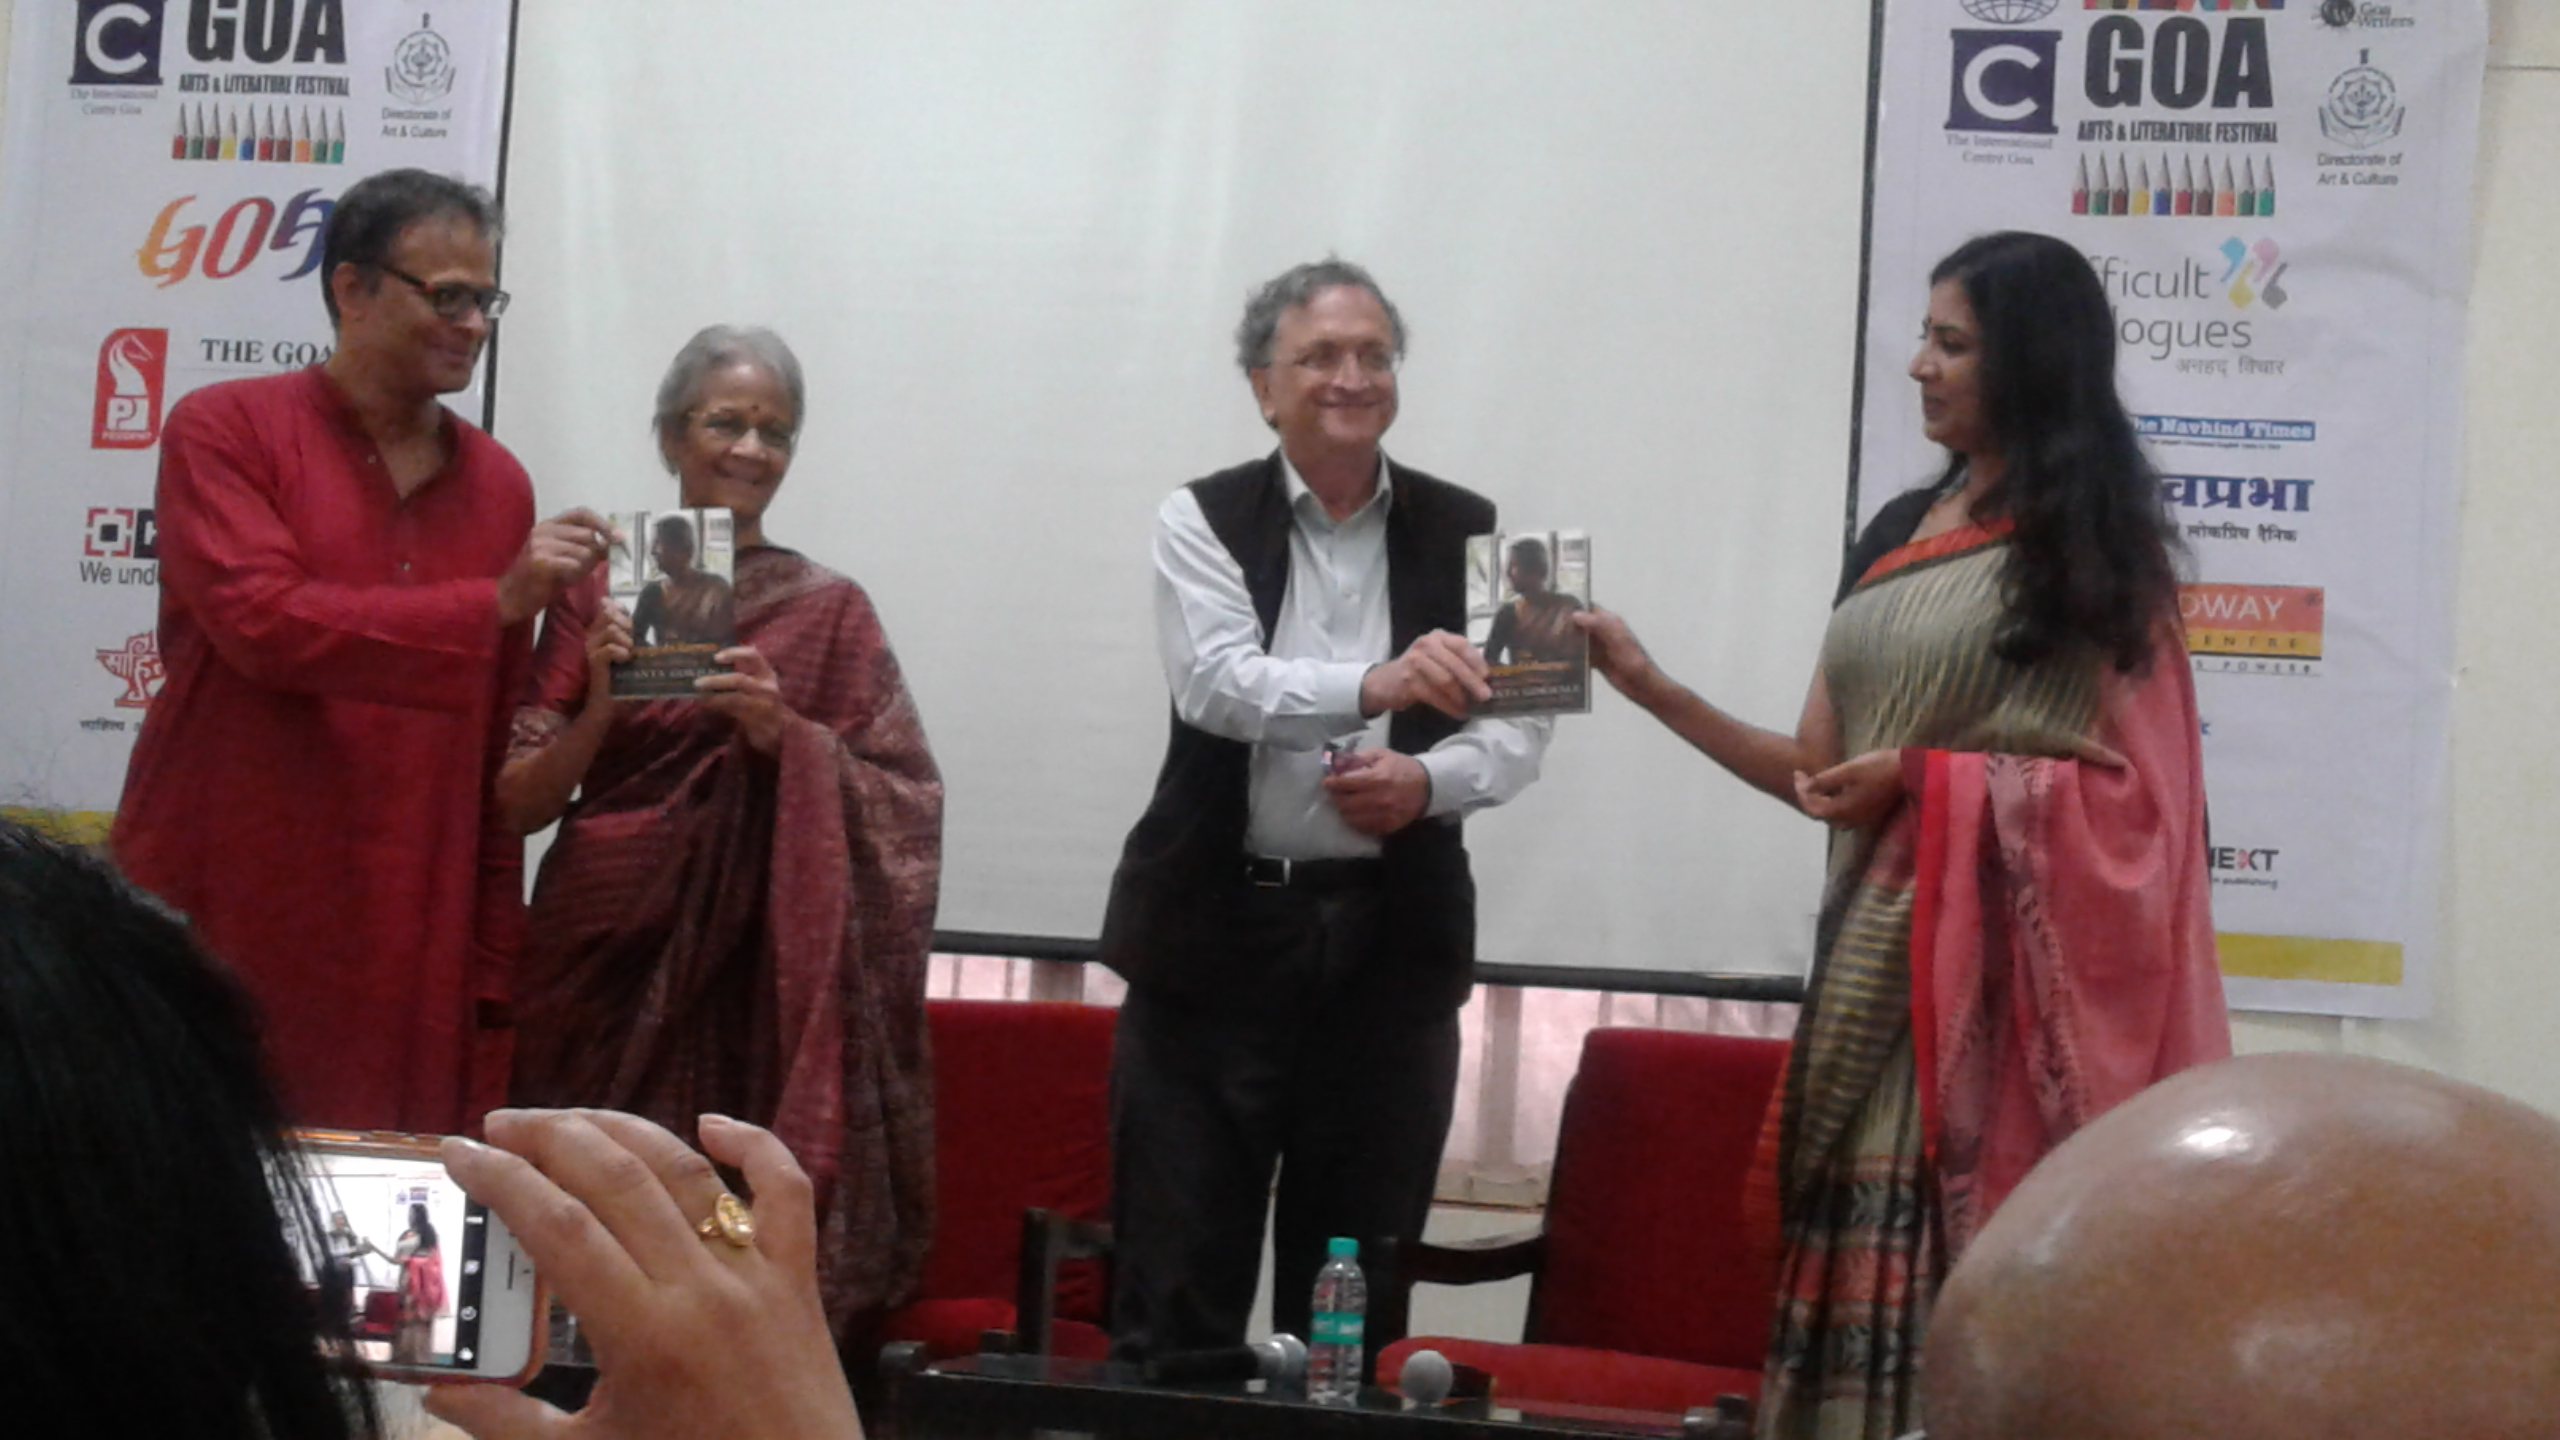 Ram Guha releasing Shanta Gokhale's book